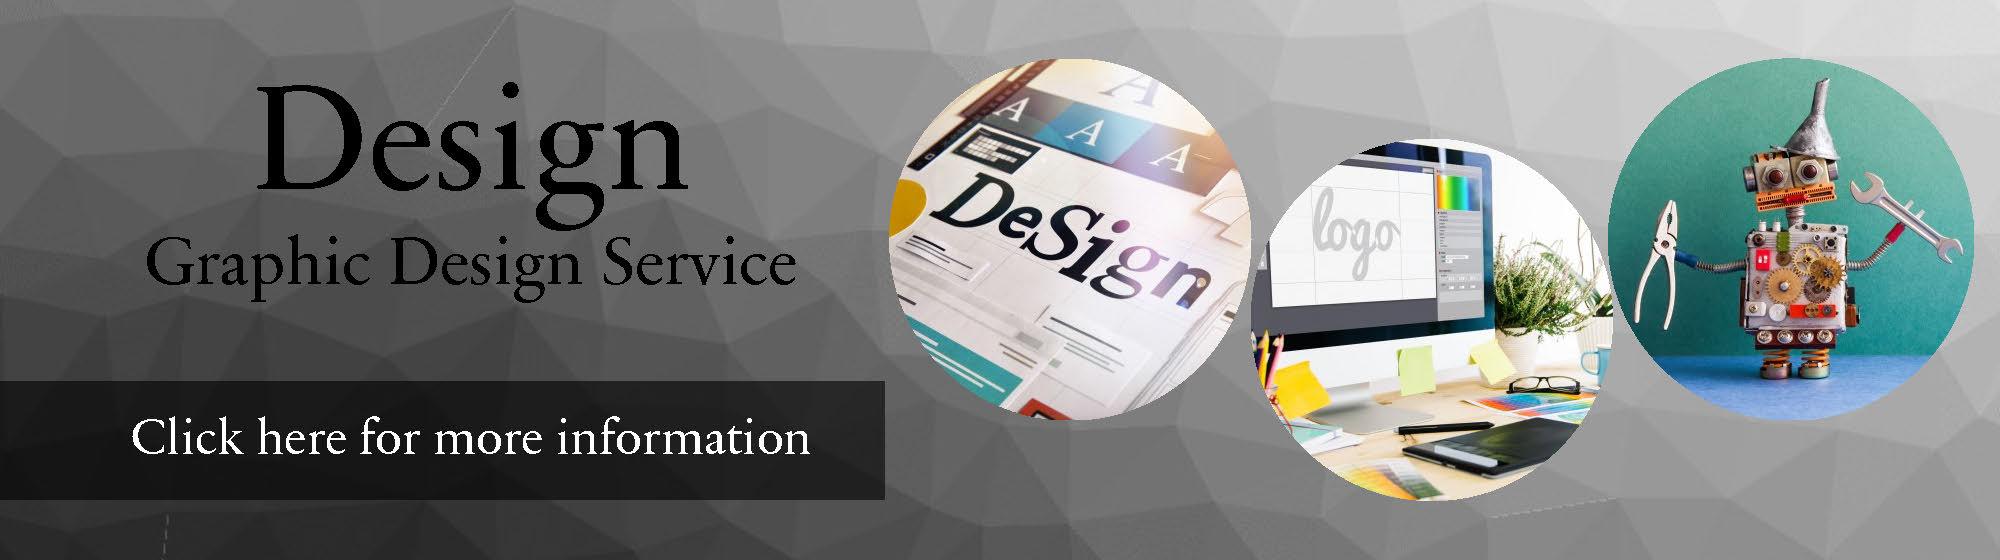 Webheadersdesign